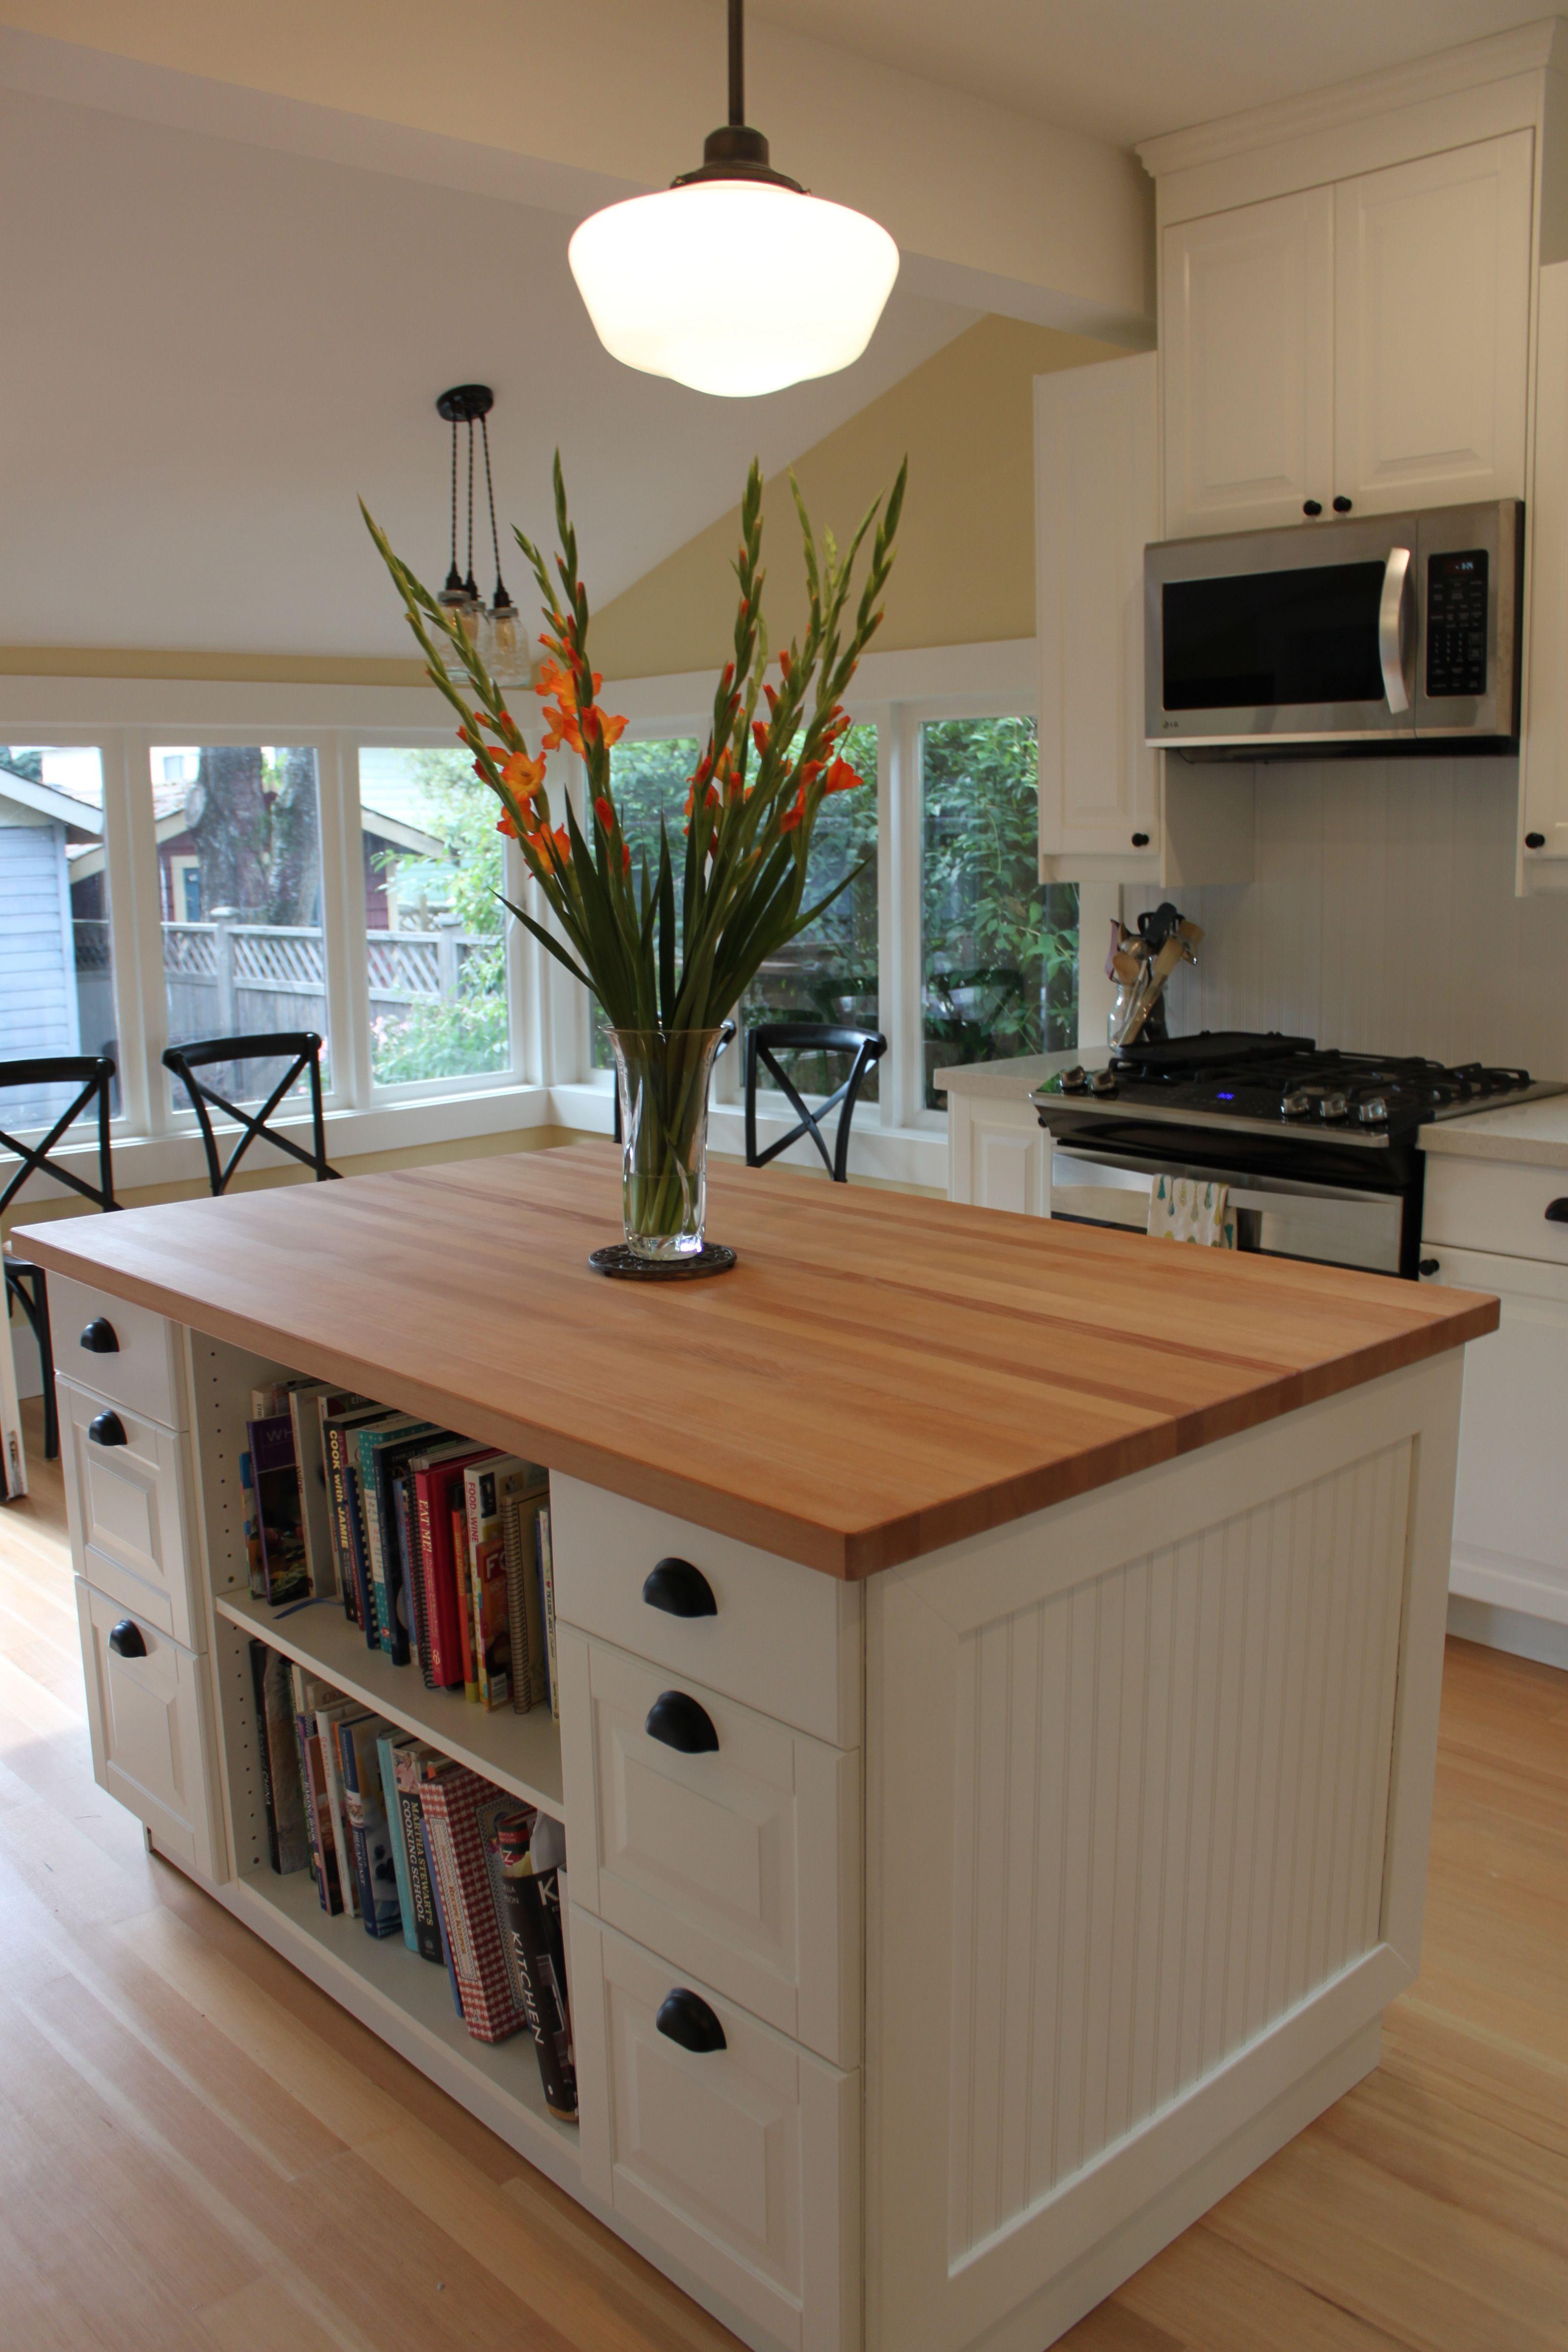 Amber's bright, new IKEA kitchen Ikea kitchen island